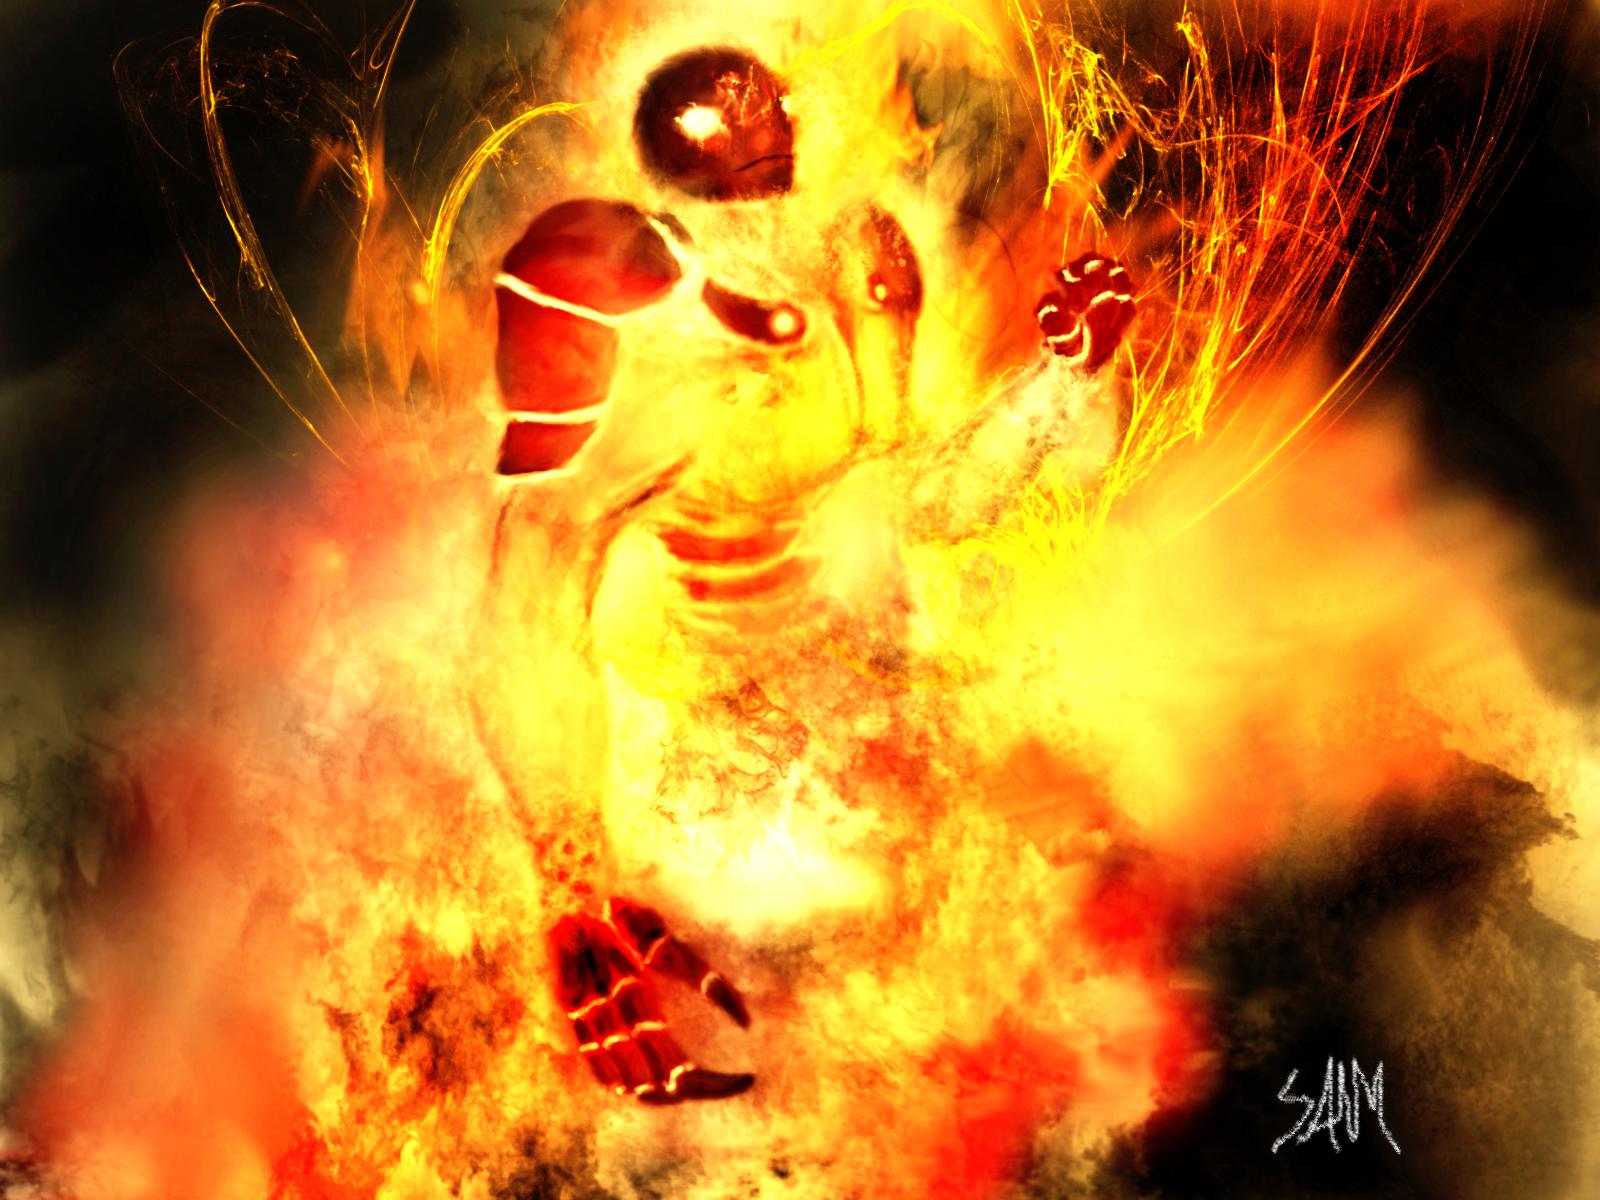 Inferno (Cinder - Killer Instinct) by Varzaul